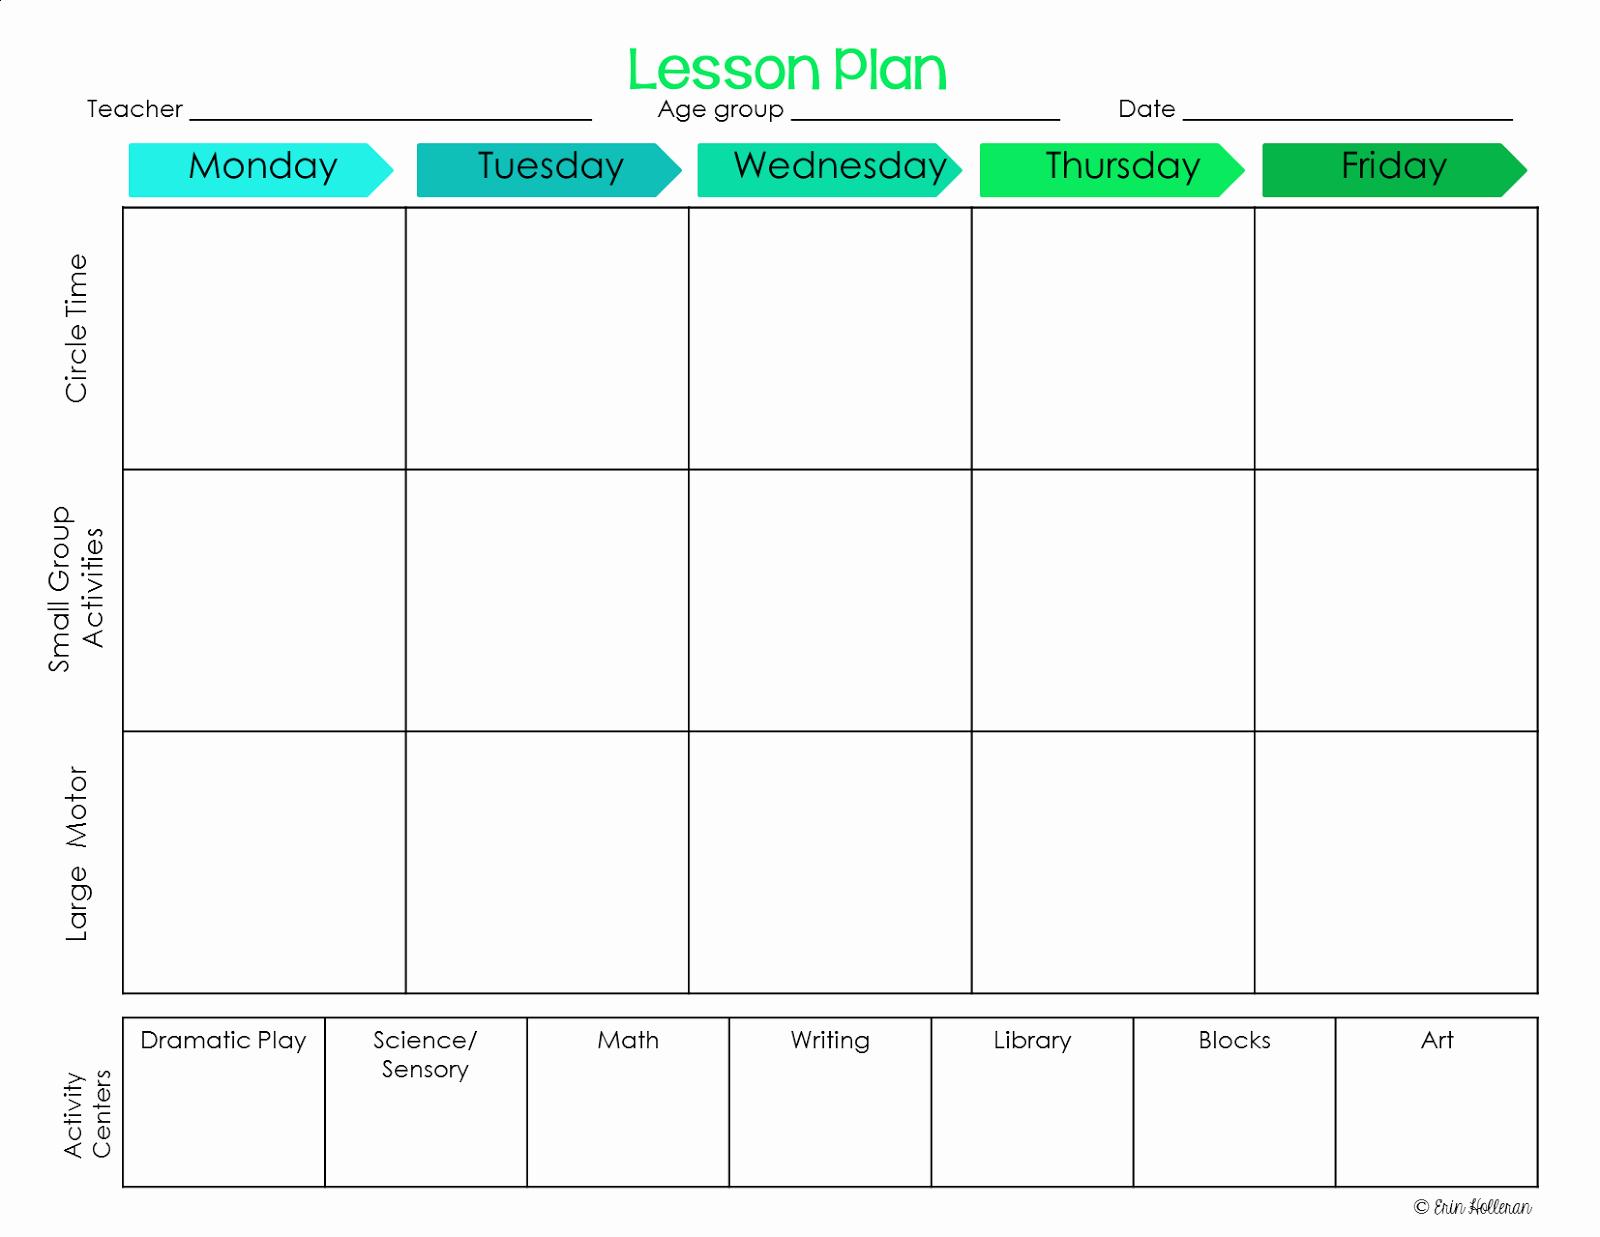 Blank Preschool Lesson Plan Template Elegant Preschool Ponderings Make Your Lesson Plans Work for You